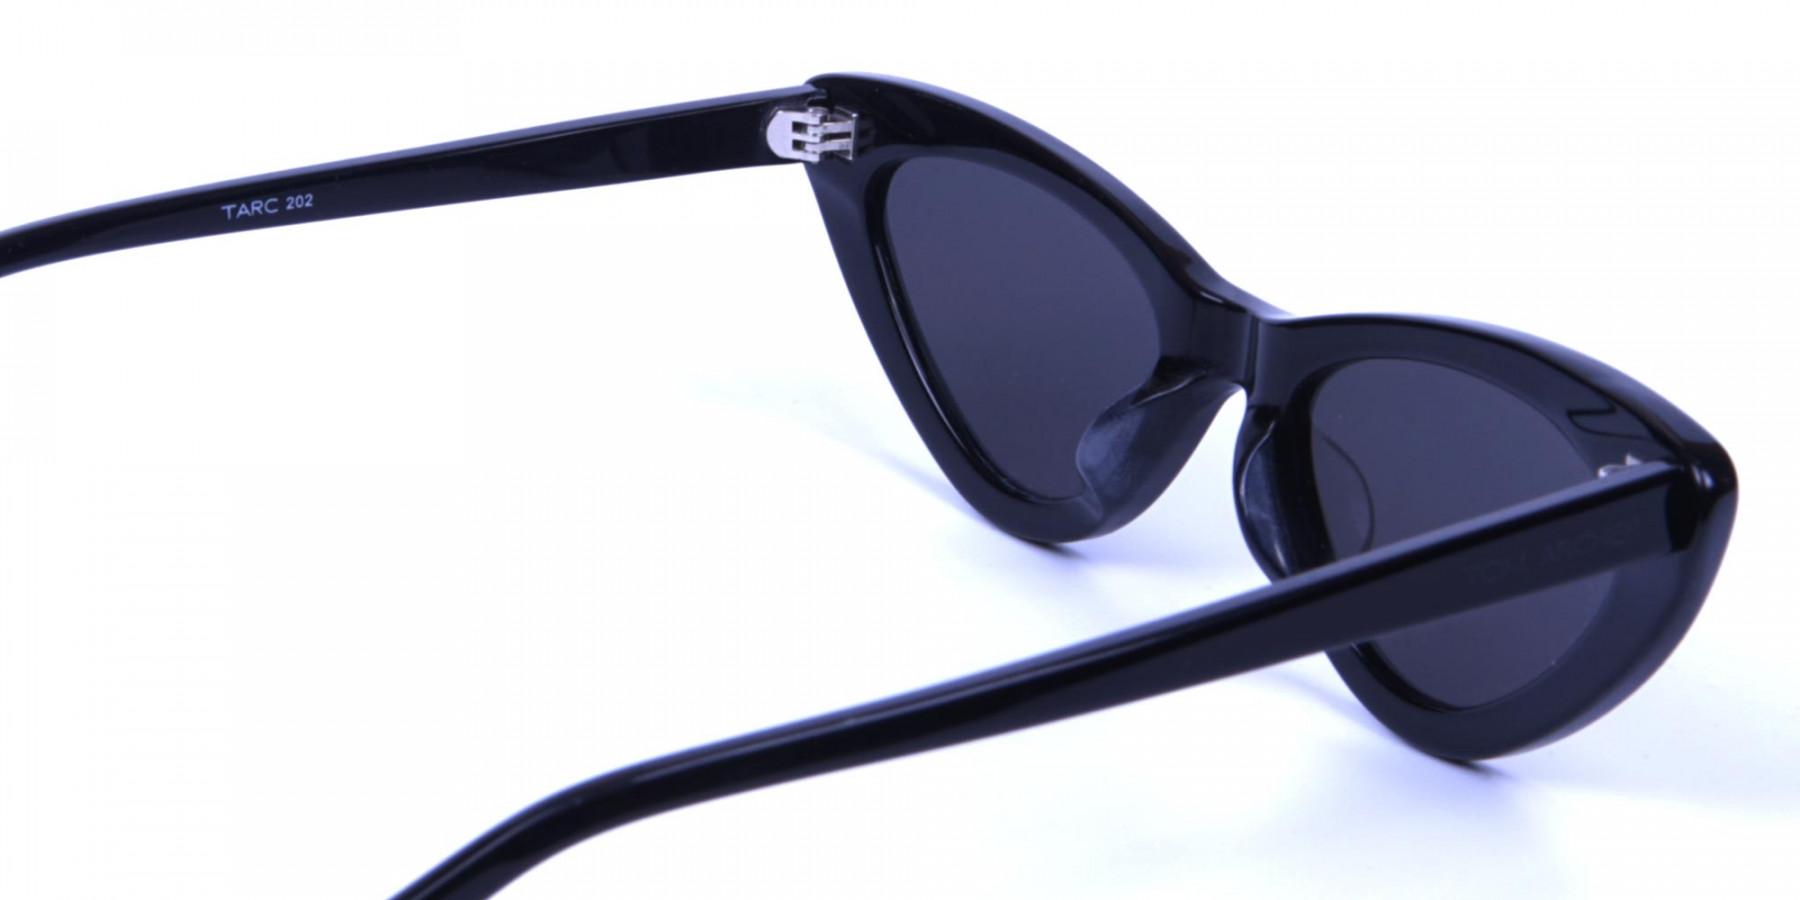 Black Narrow Cat-Eye Sunglasses - 2